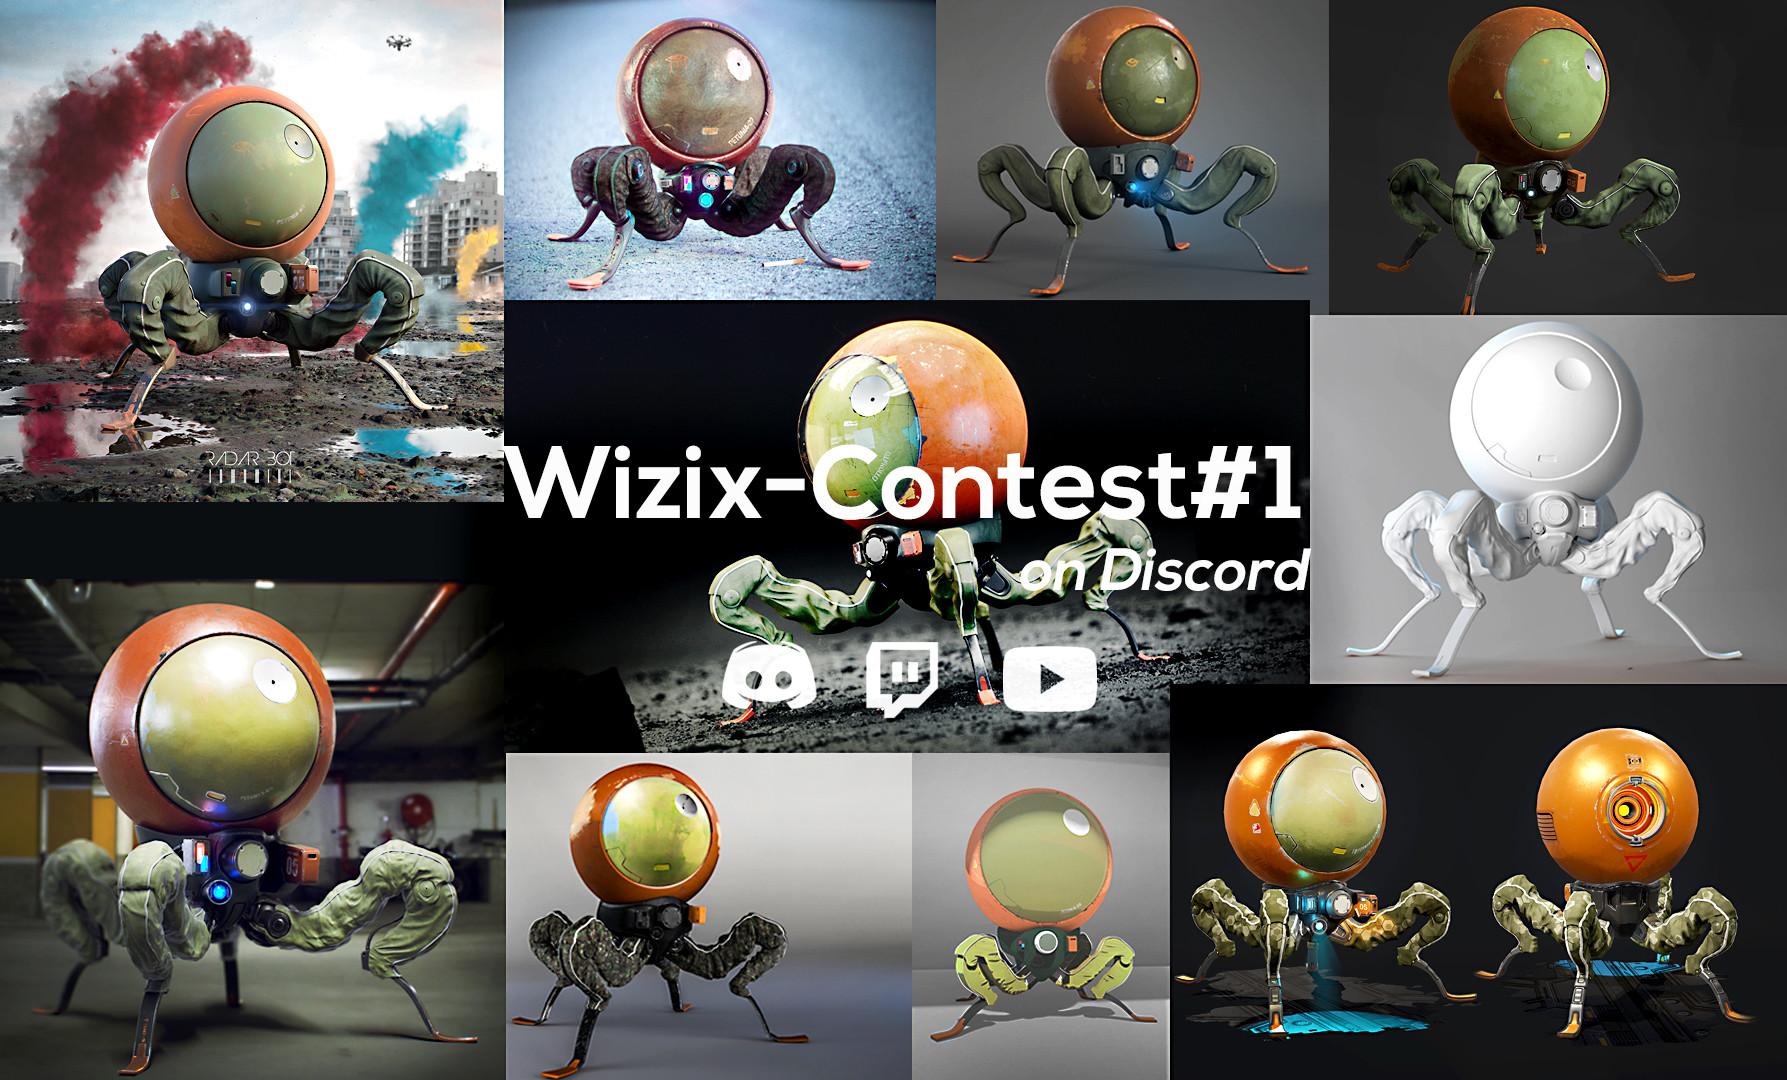 Wizix wizix contest 1